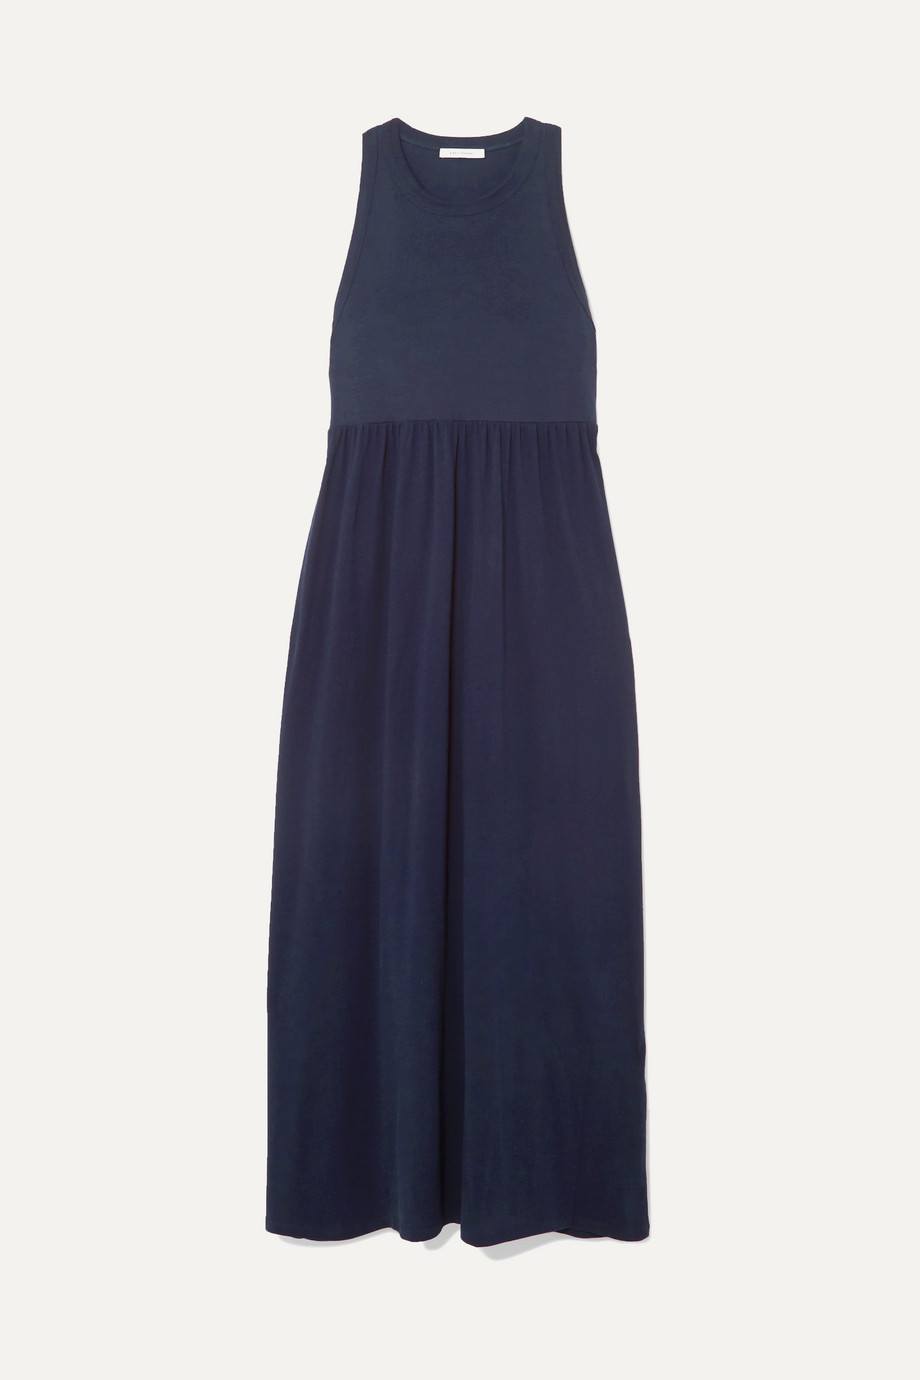 Ninety Percent | Organic cotton-jersey maxi dress | NET-A-PORTER.COM